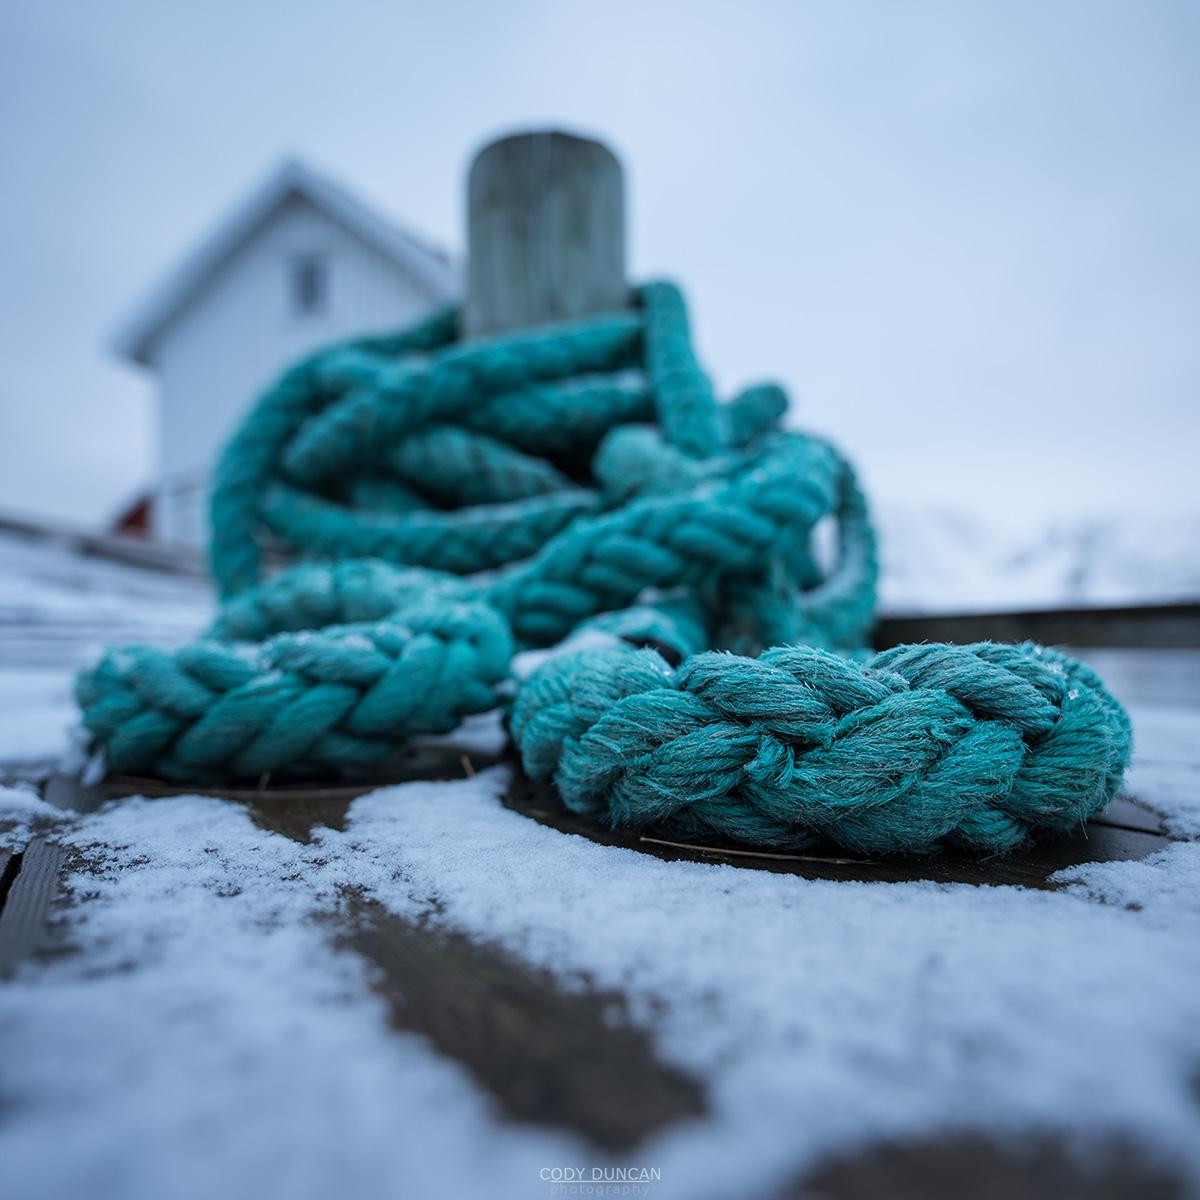 Rope - Friday Photo #269